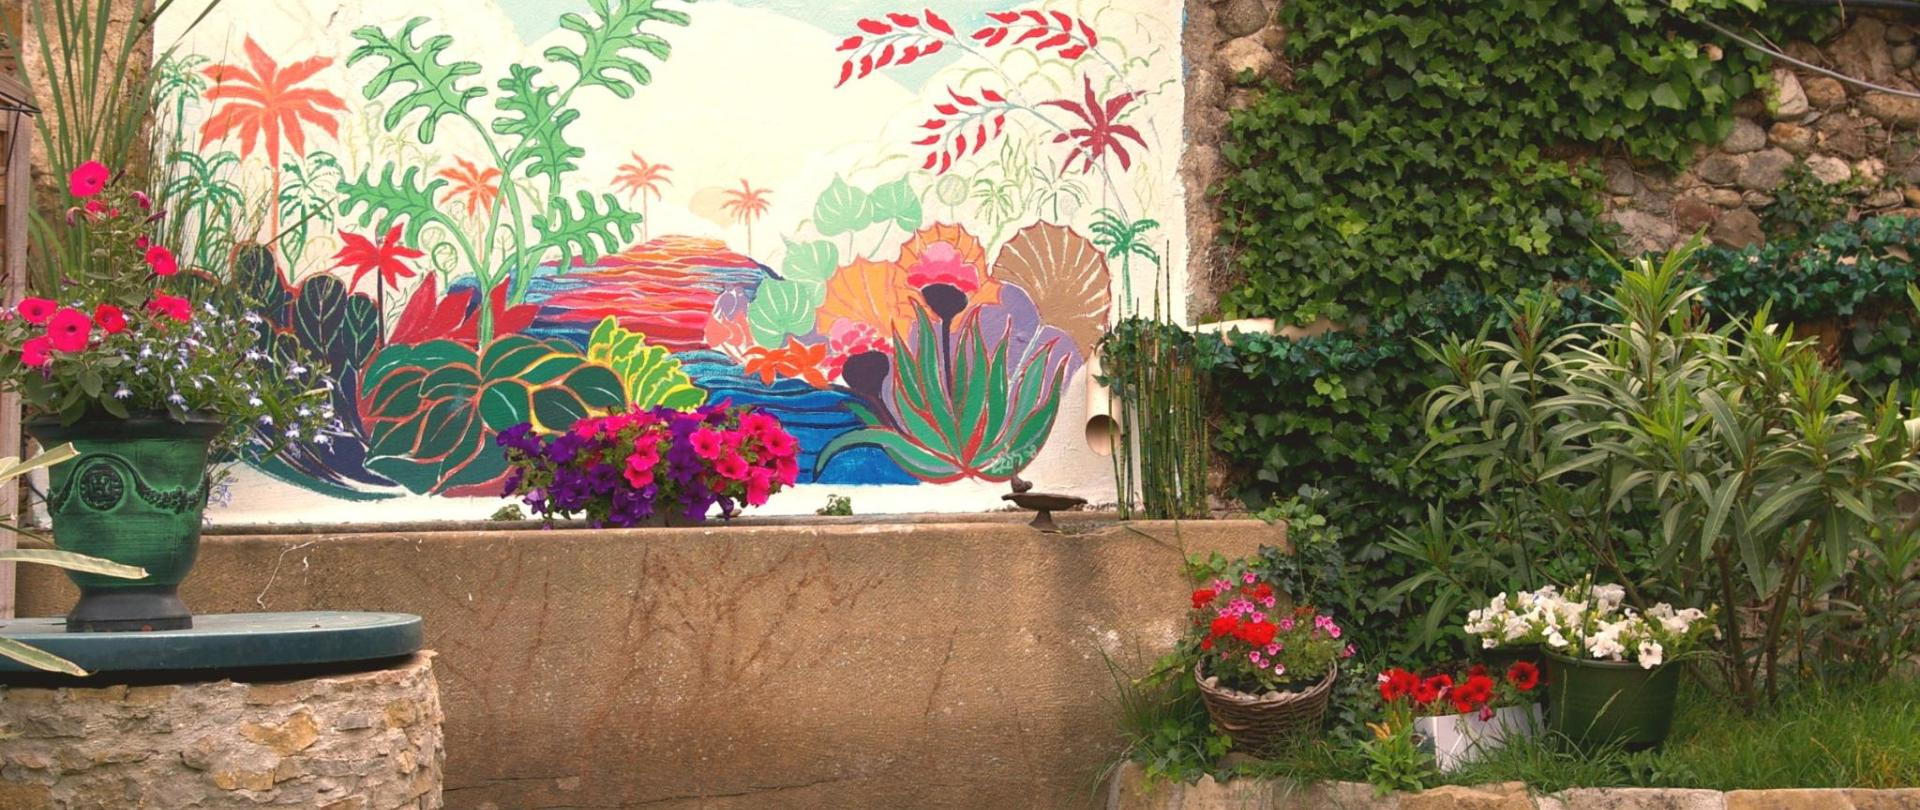 peinture jardin abreuvoir182.jpg